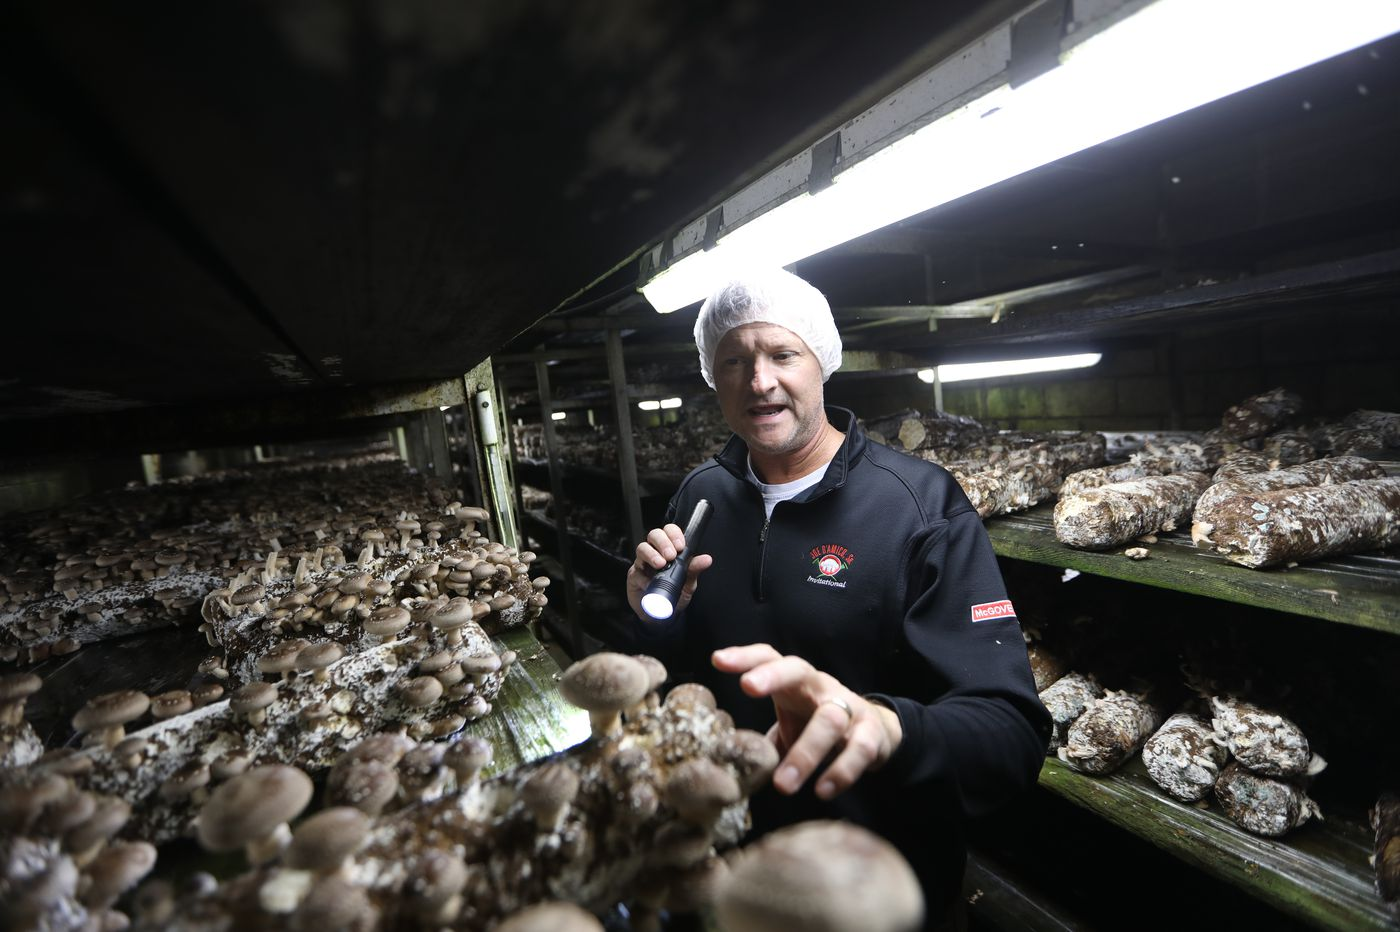 Mushroom politics: Chesco farms seek immigrant workers